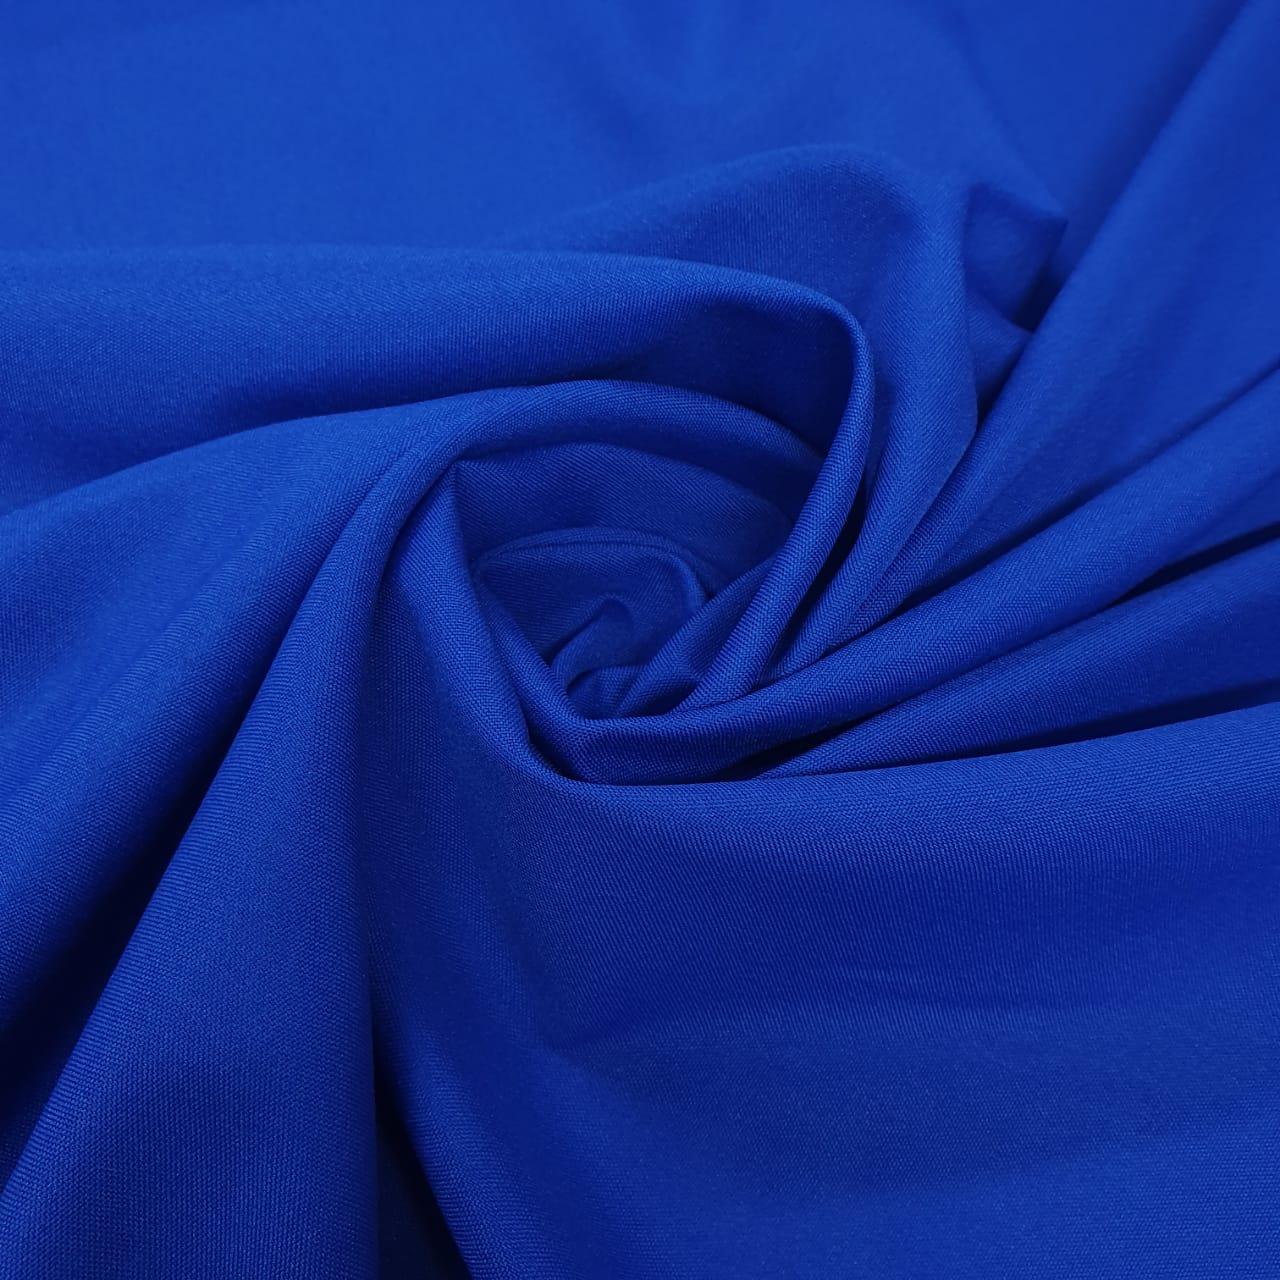 Tecido Oxford Liso Azul Royal - 1,50m de Largura